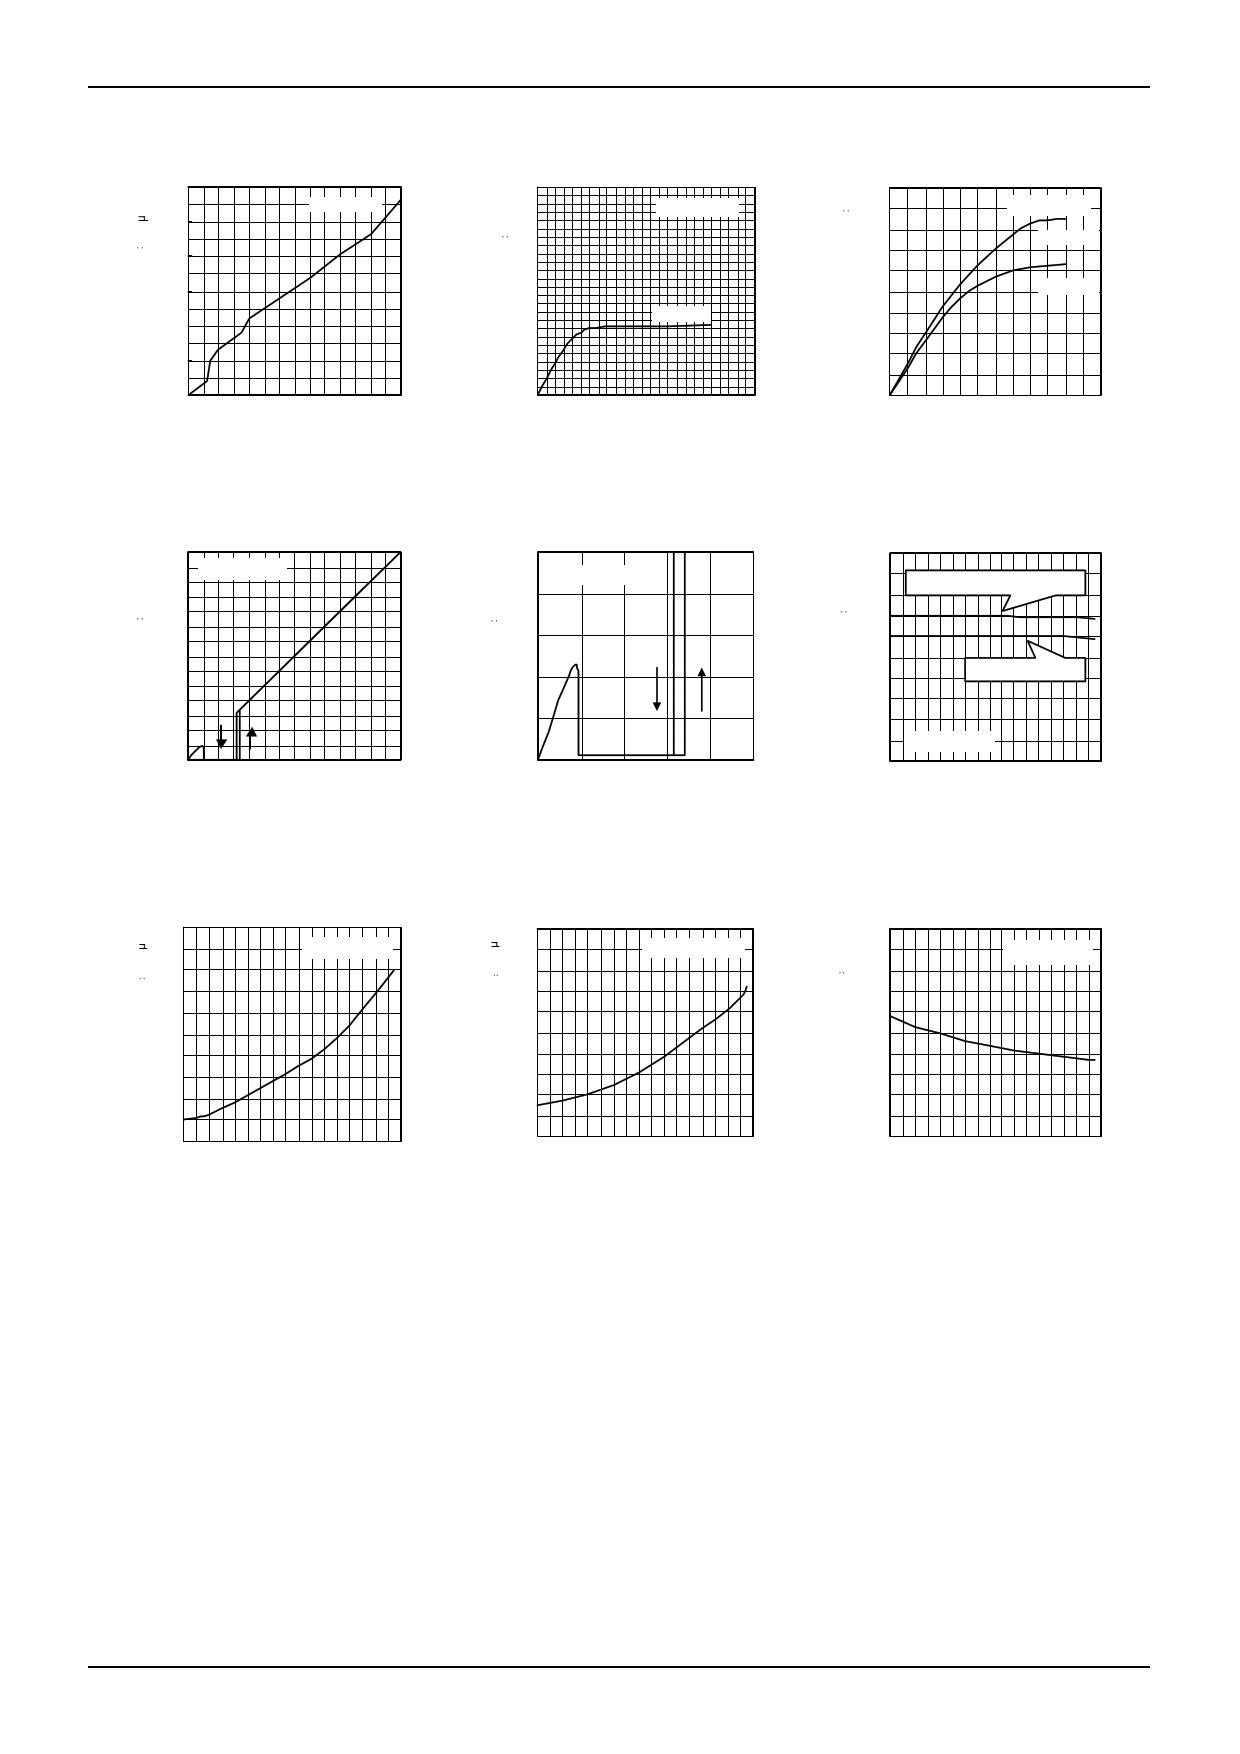 BU4946 pdf, 반도체, 판매, 대치품